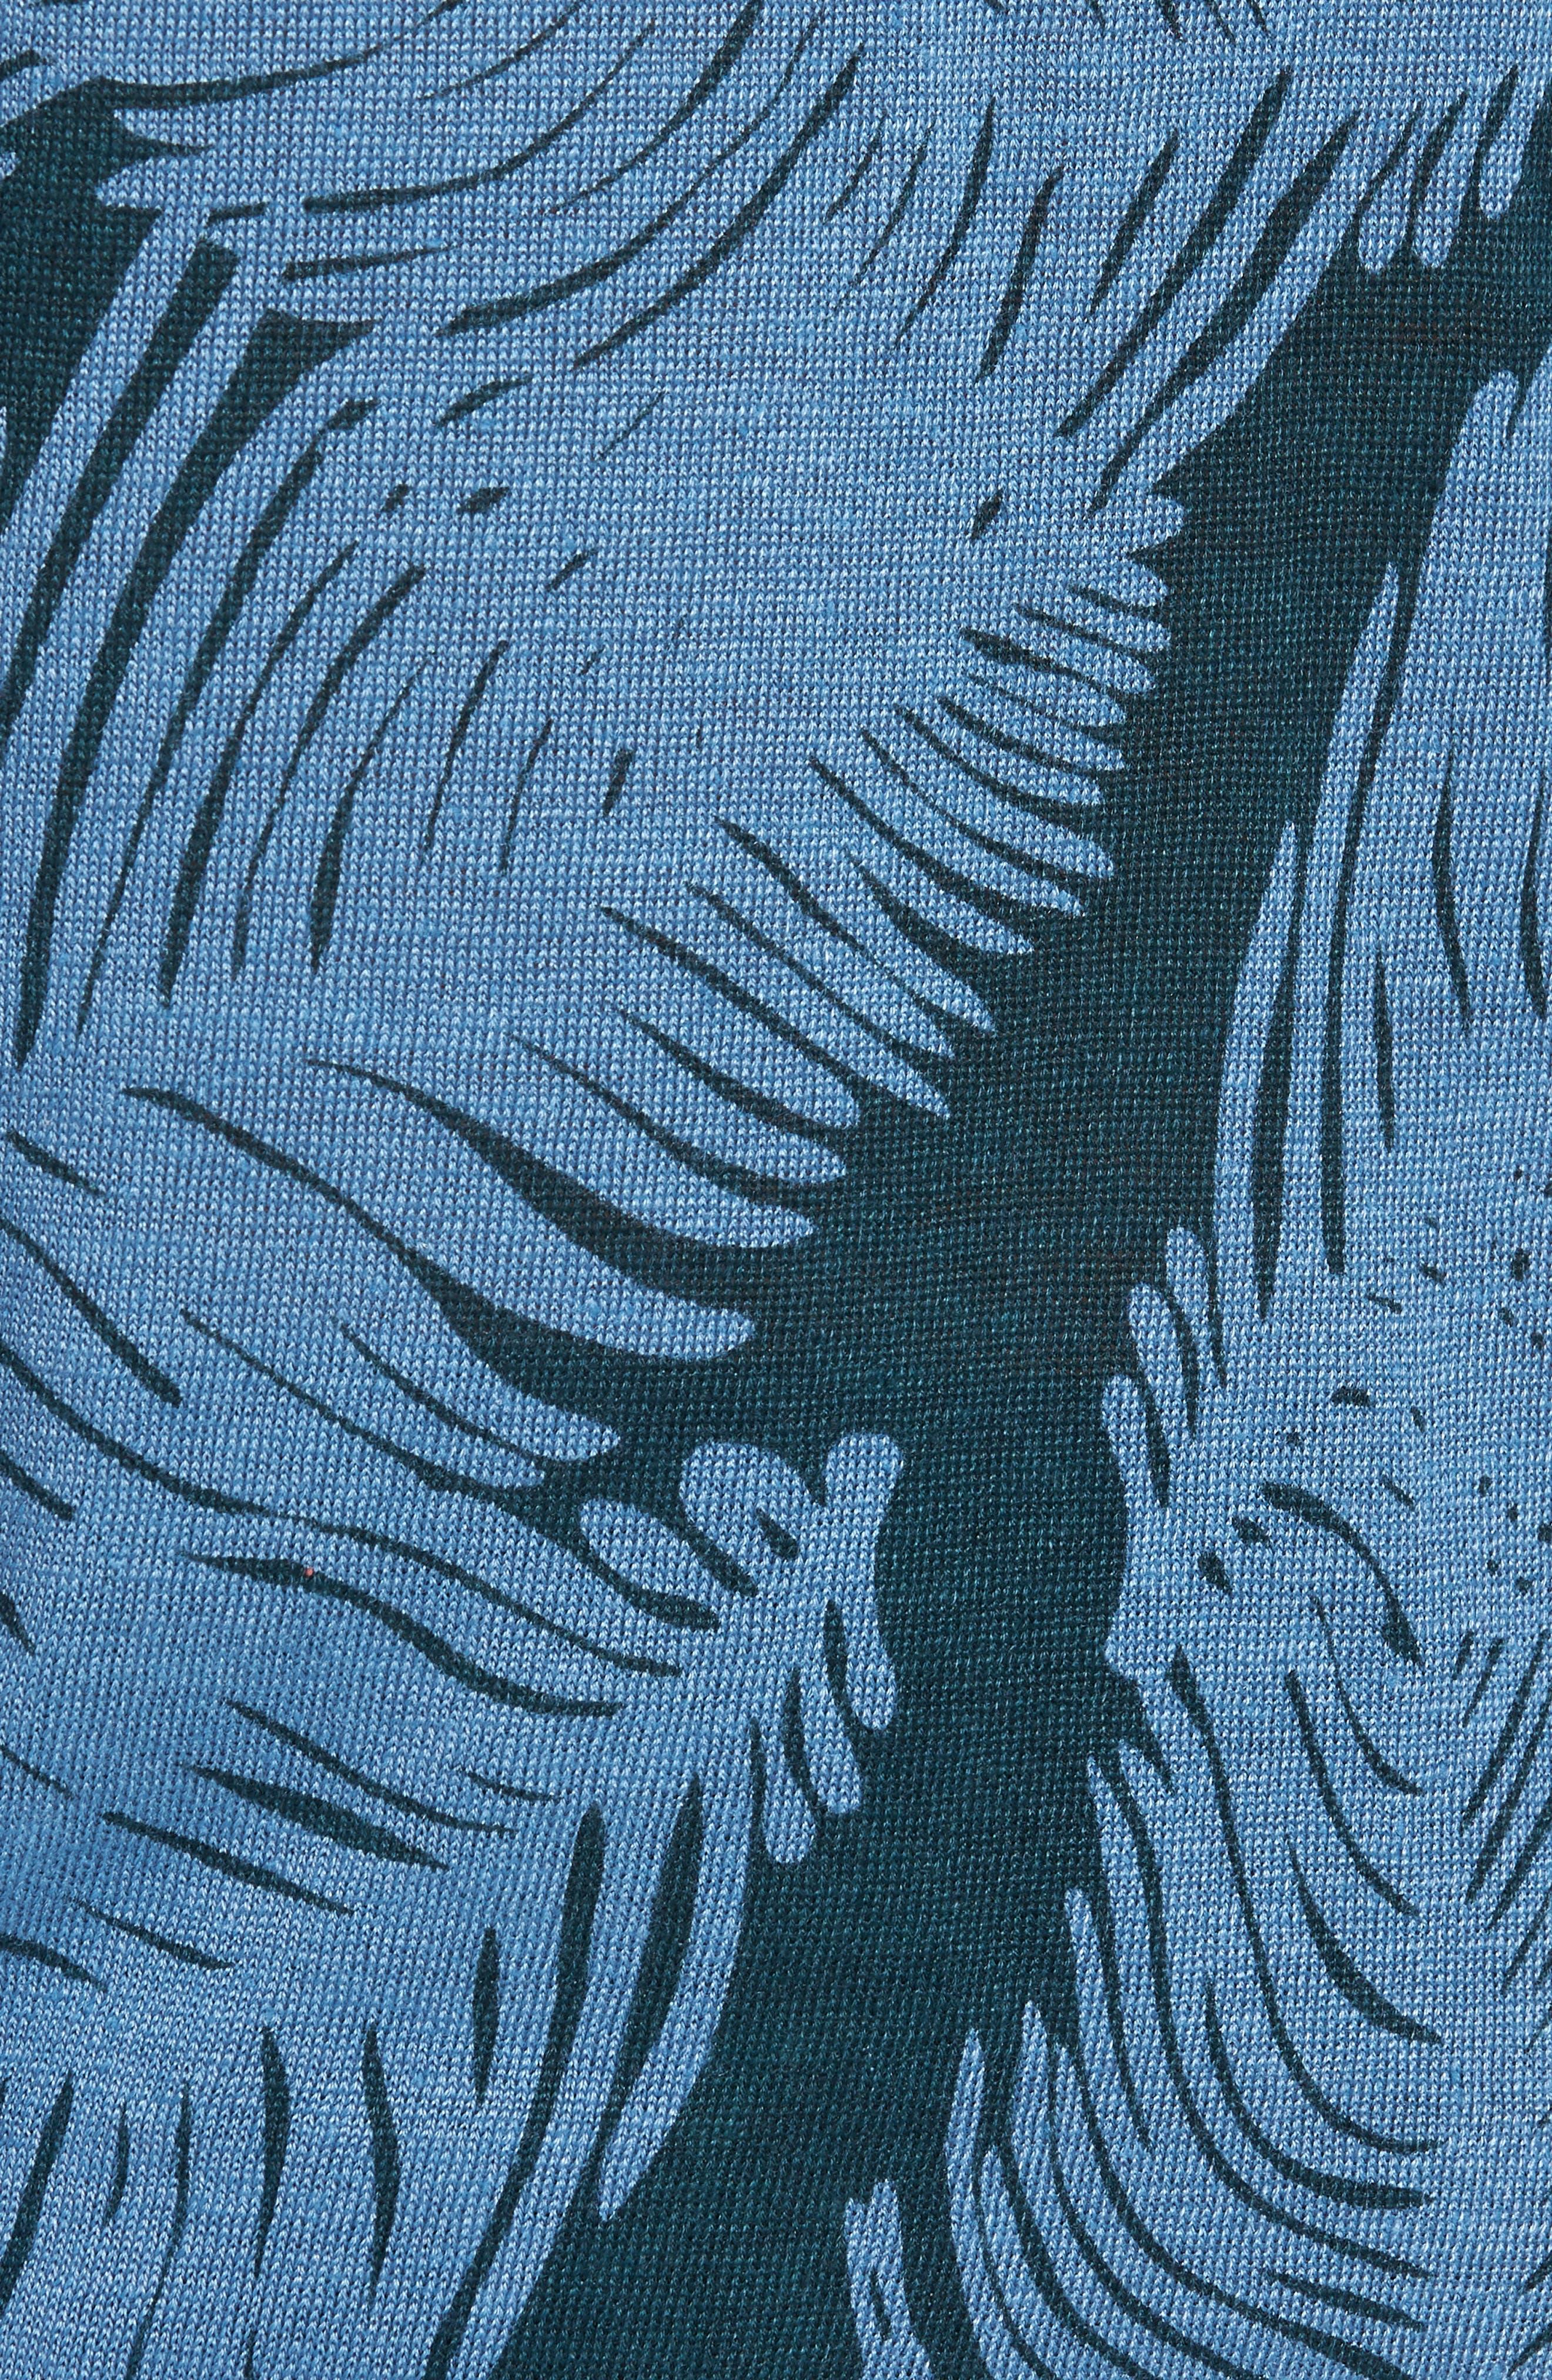 Palm Print Linen Sweater,                             Alternate thumbnail 5, color,                             Palm Fan Print